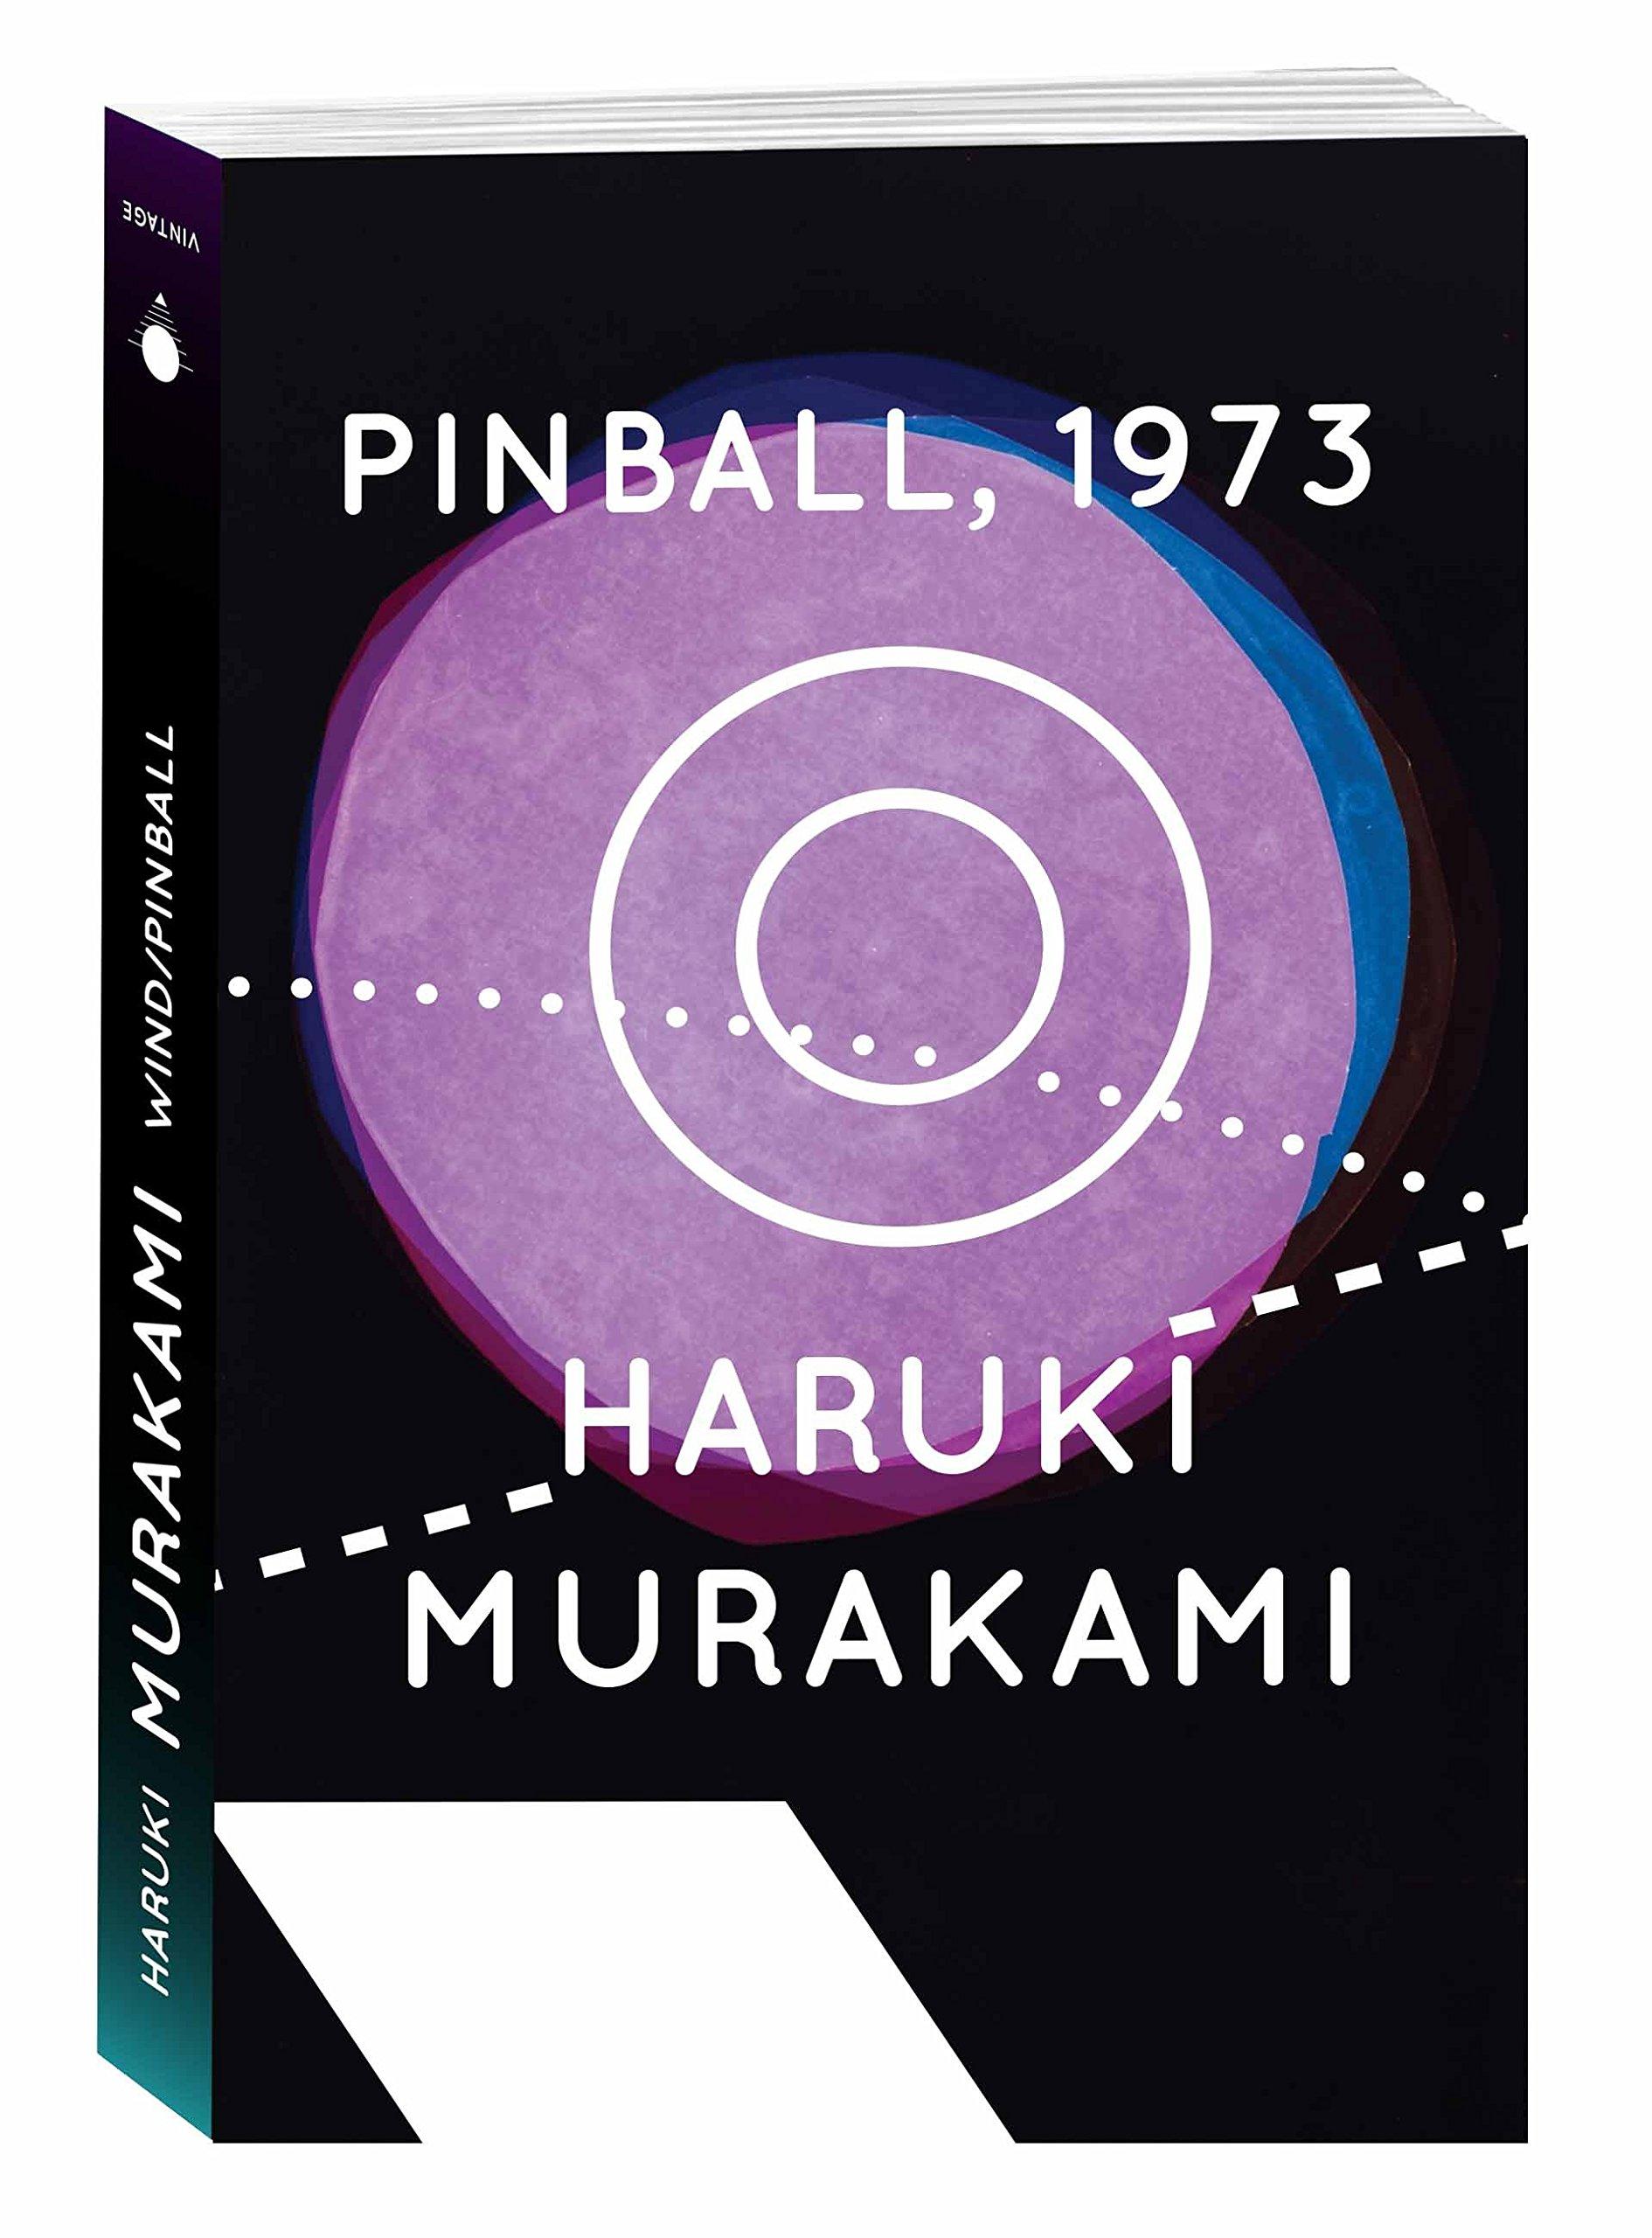 Image result for pinball 1973 murakami